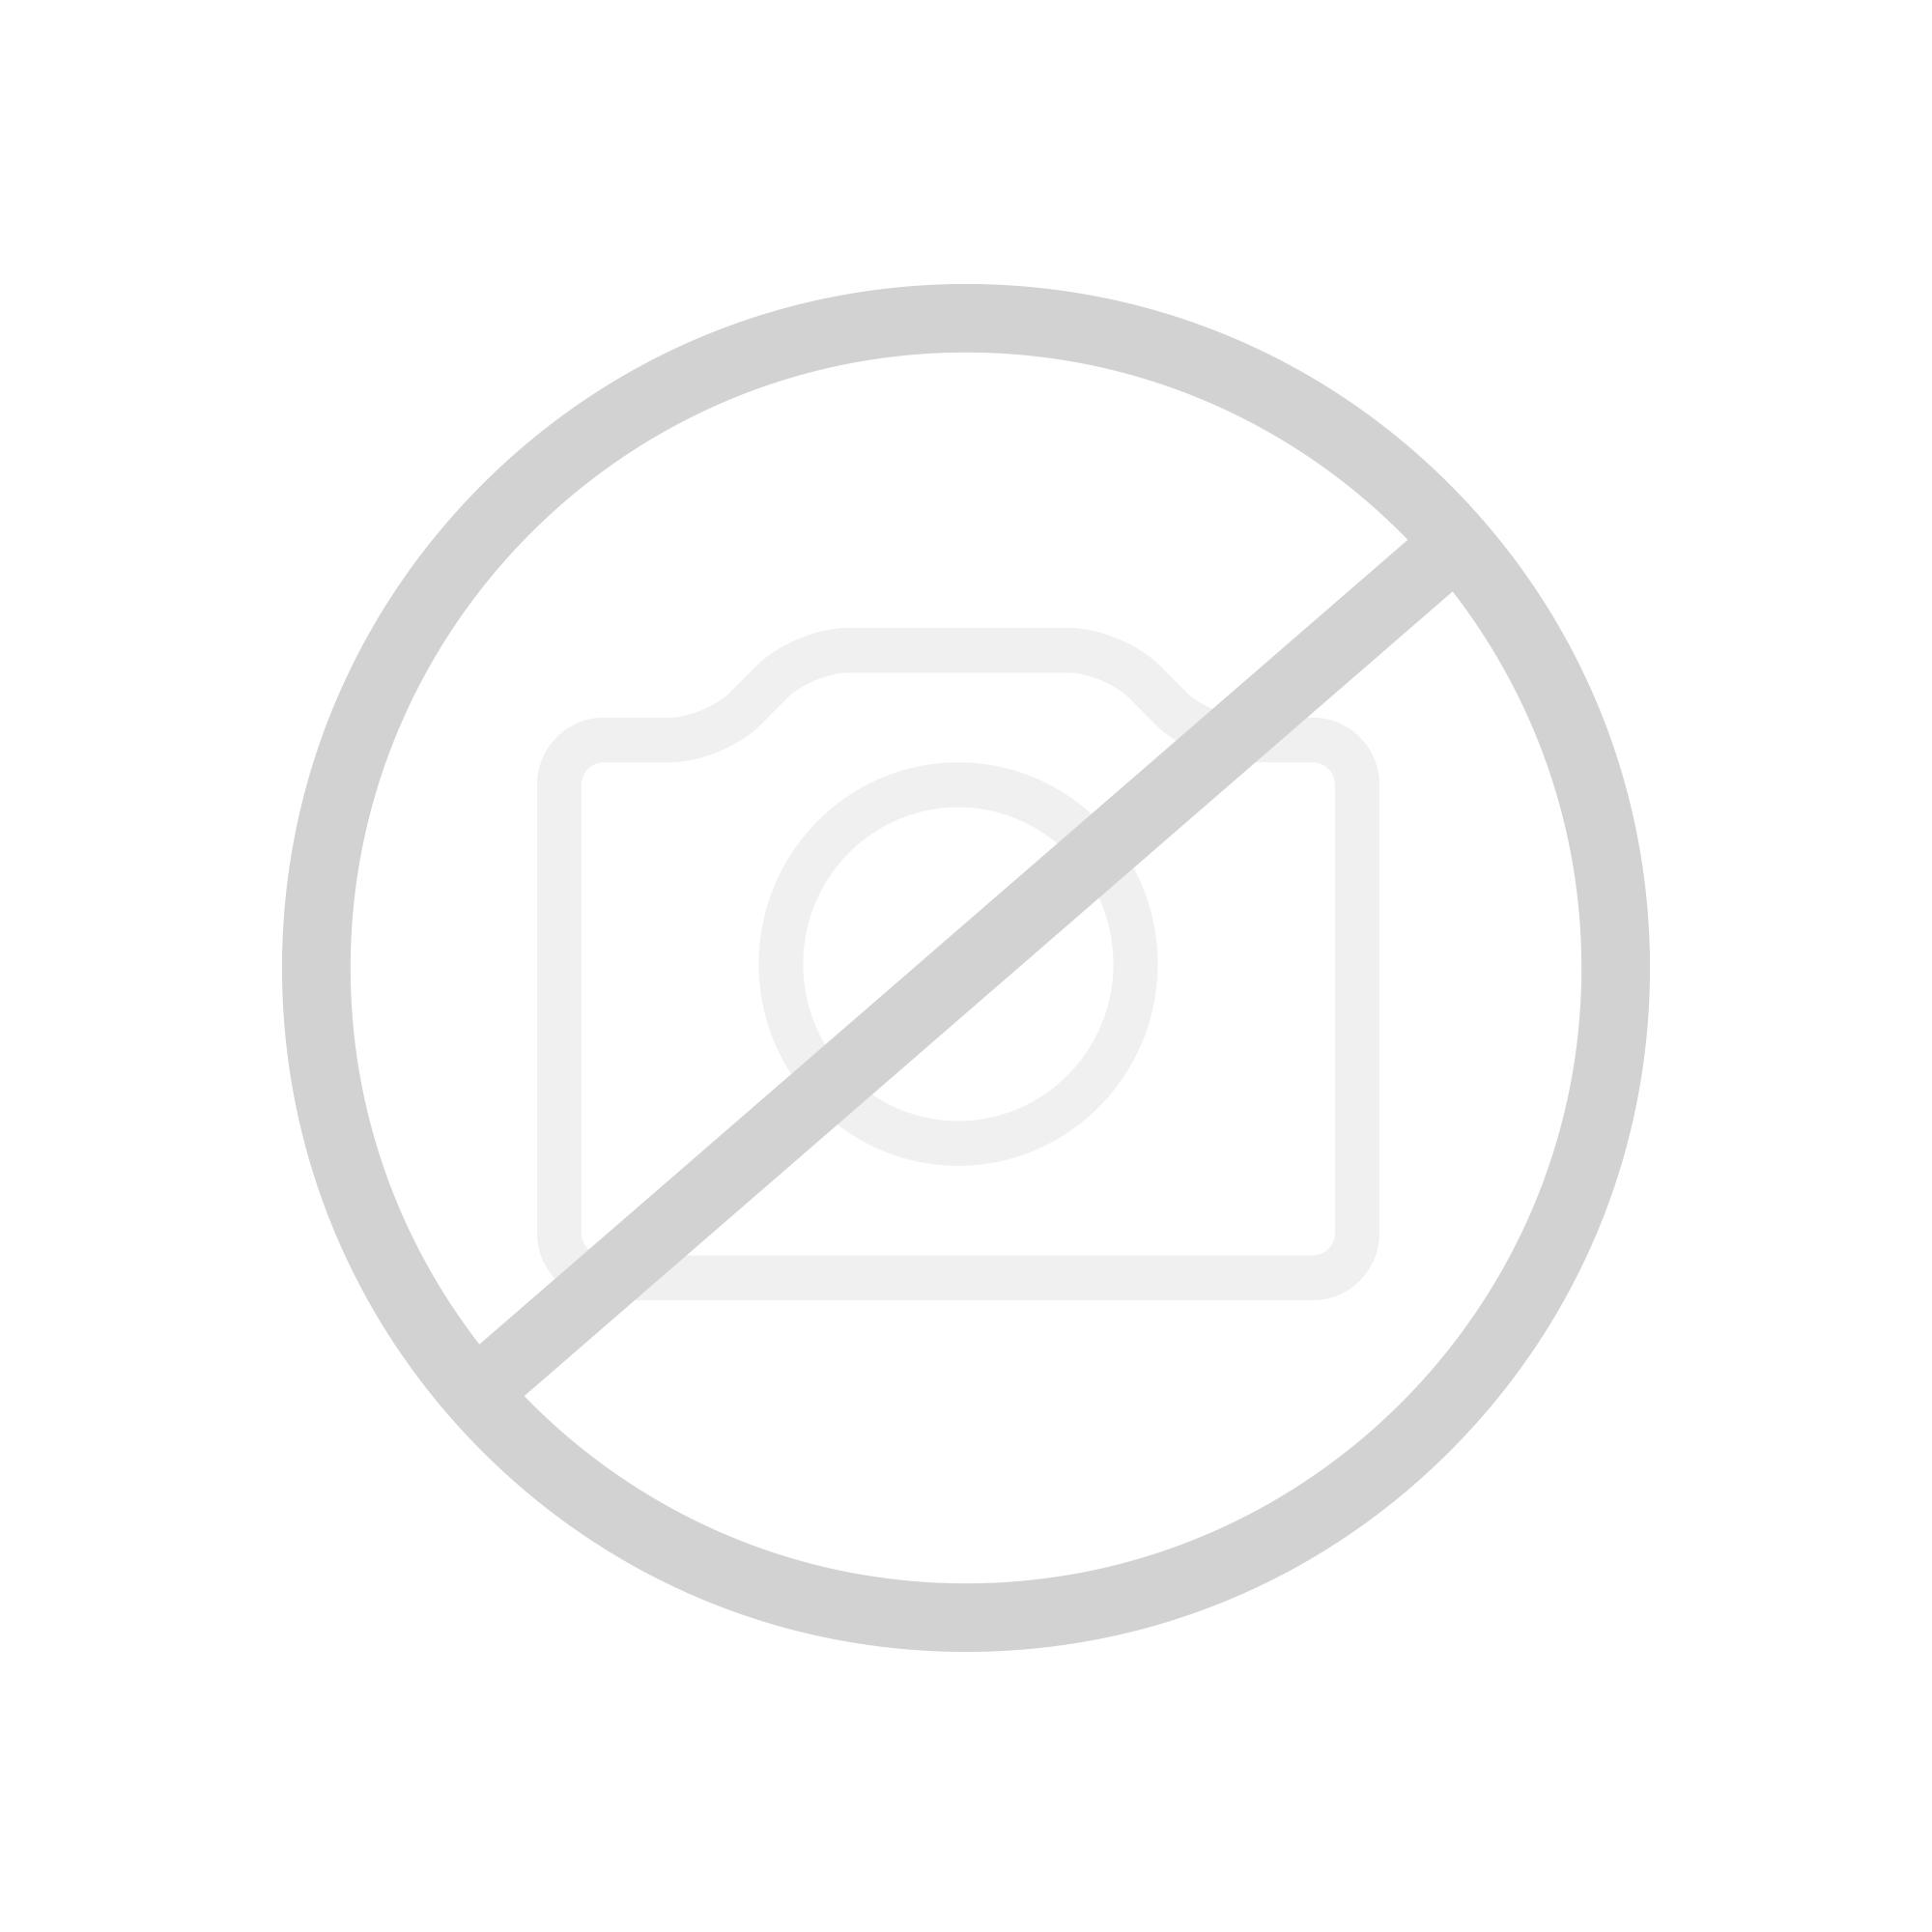 kaldewei mega duo 6 sechseck badewanne weiss perl effekt 223600013001 reuter onlineshop. Black Bedroom Furniture Sets. Home Design Ideas